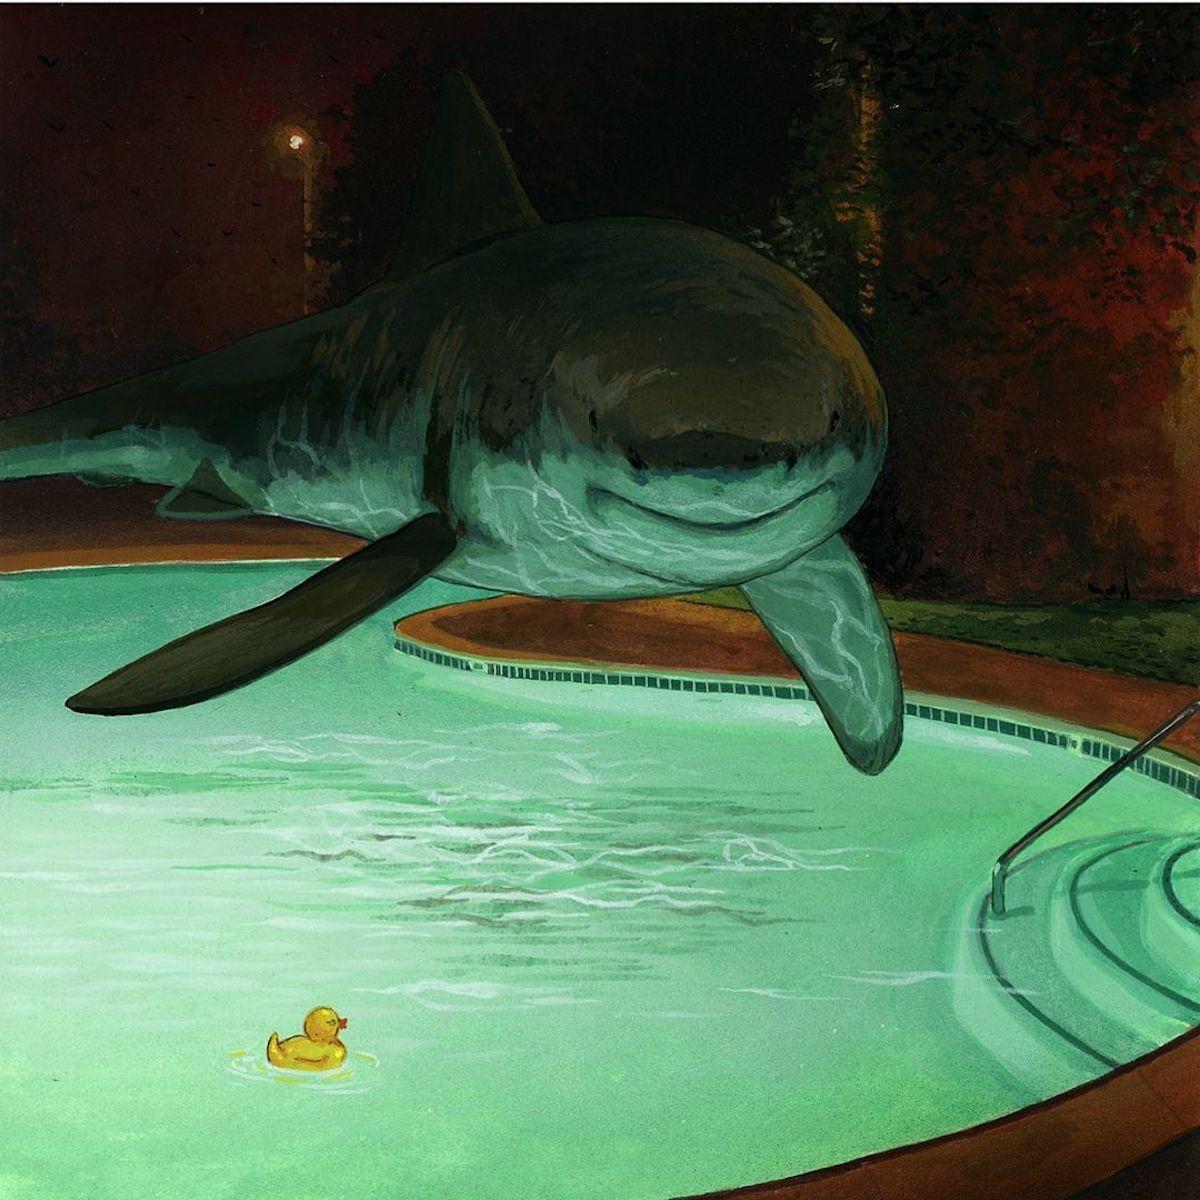 chris-austin-shark-paintings-moss-and-fog-6